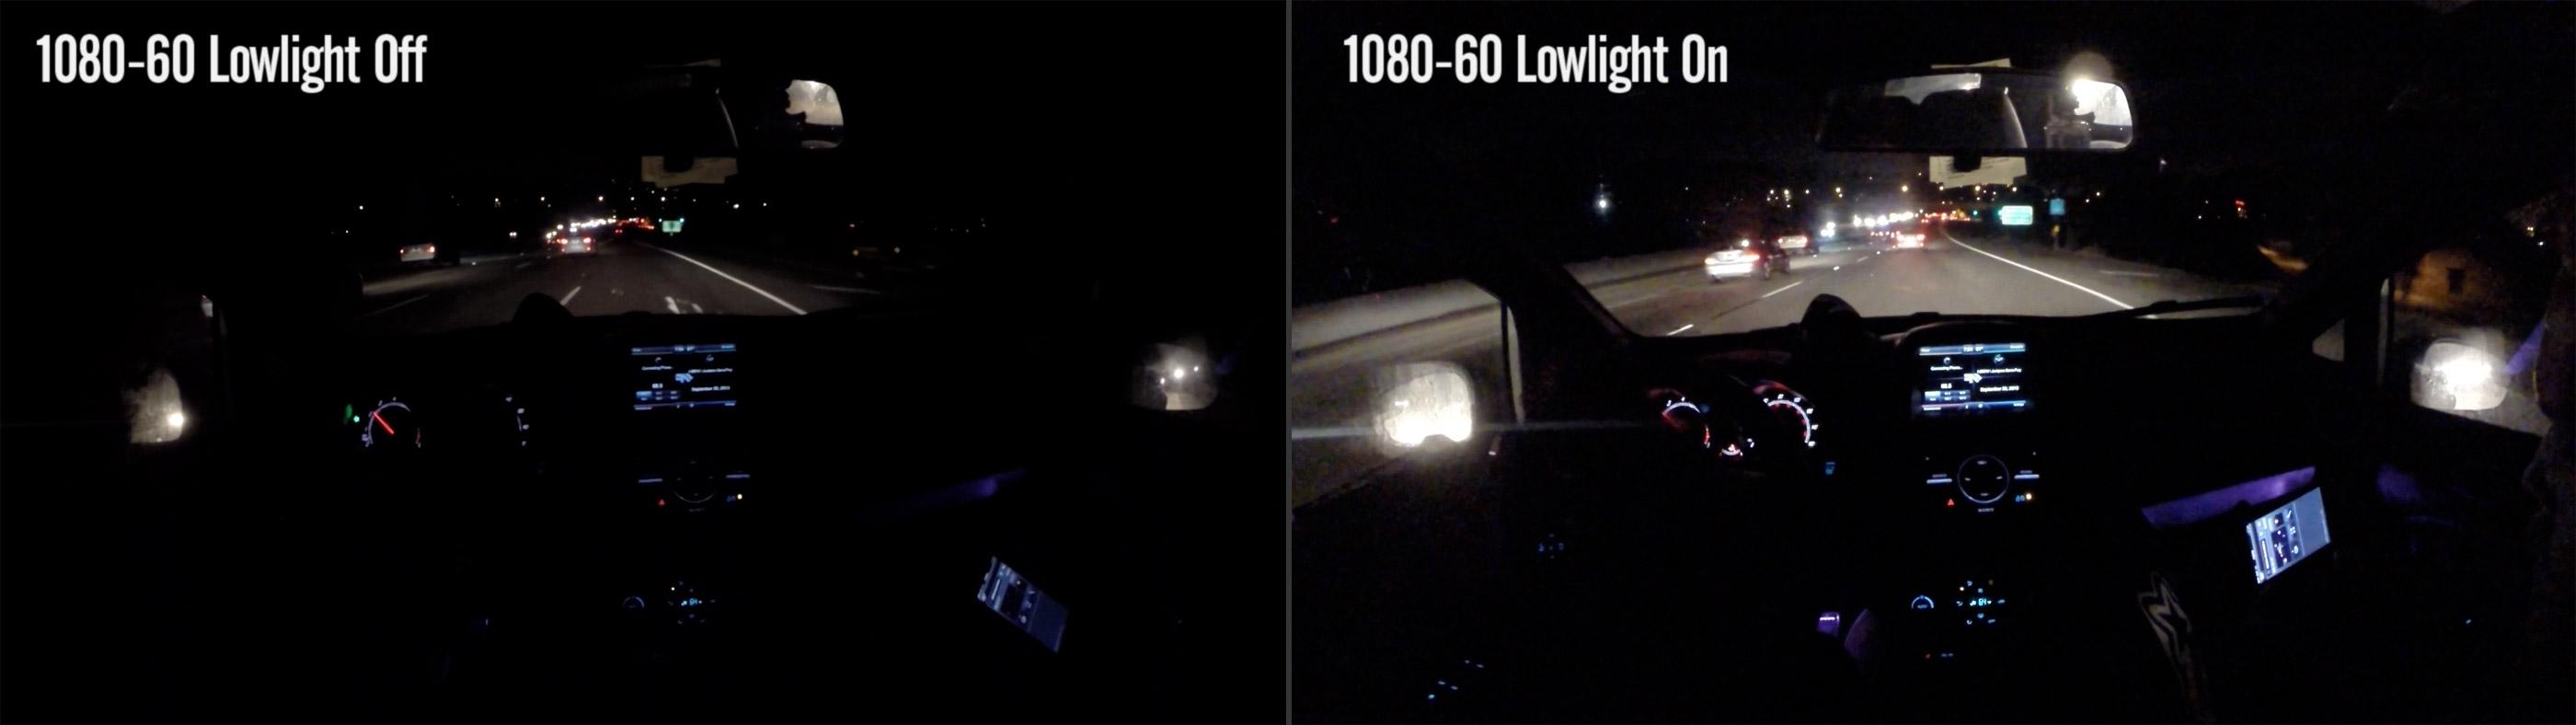 lowlight